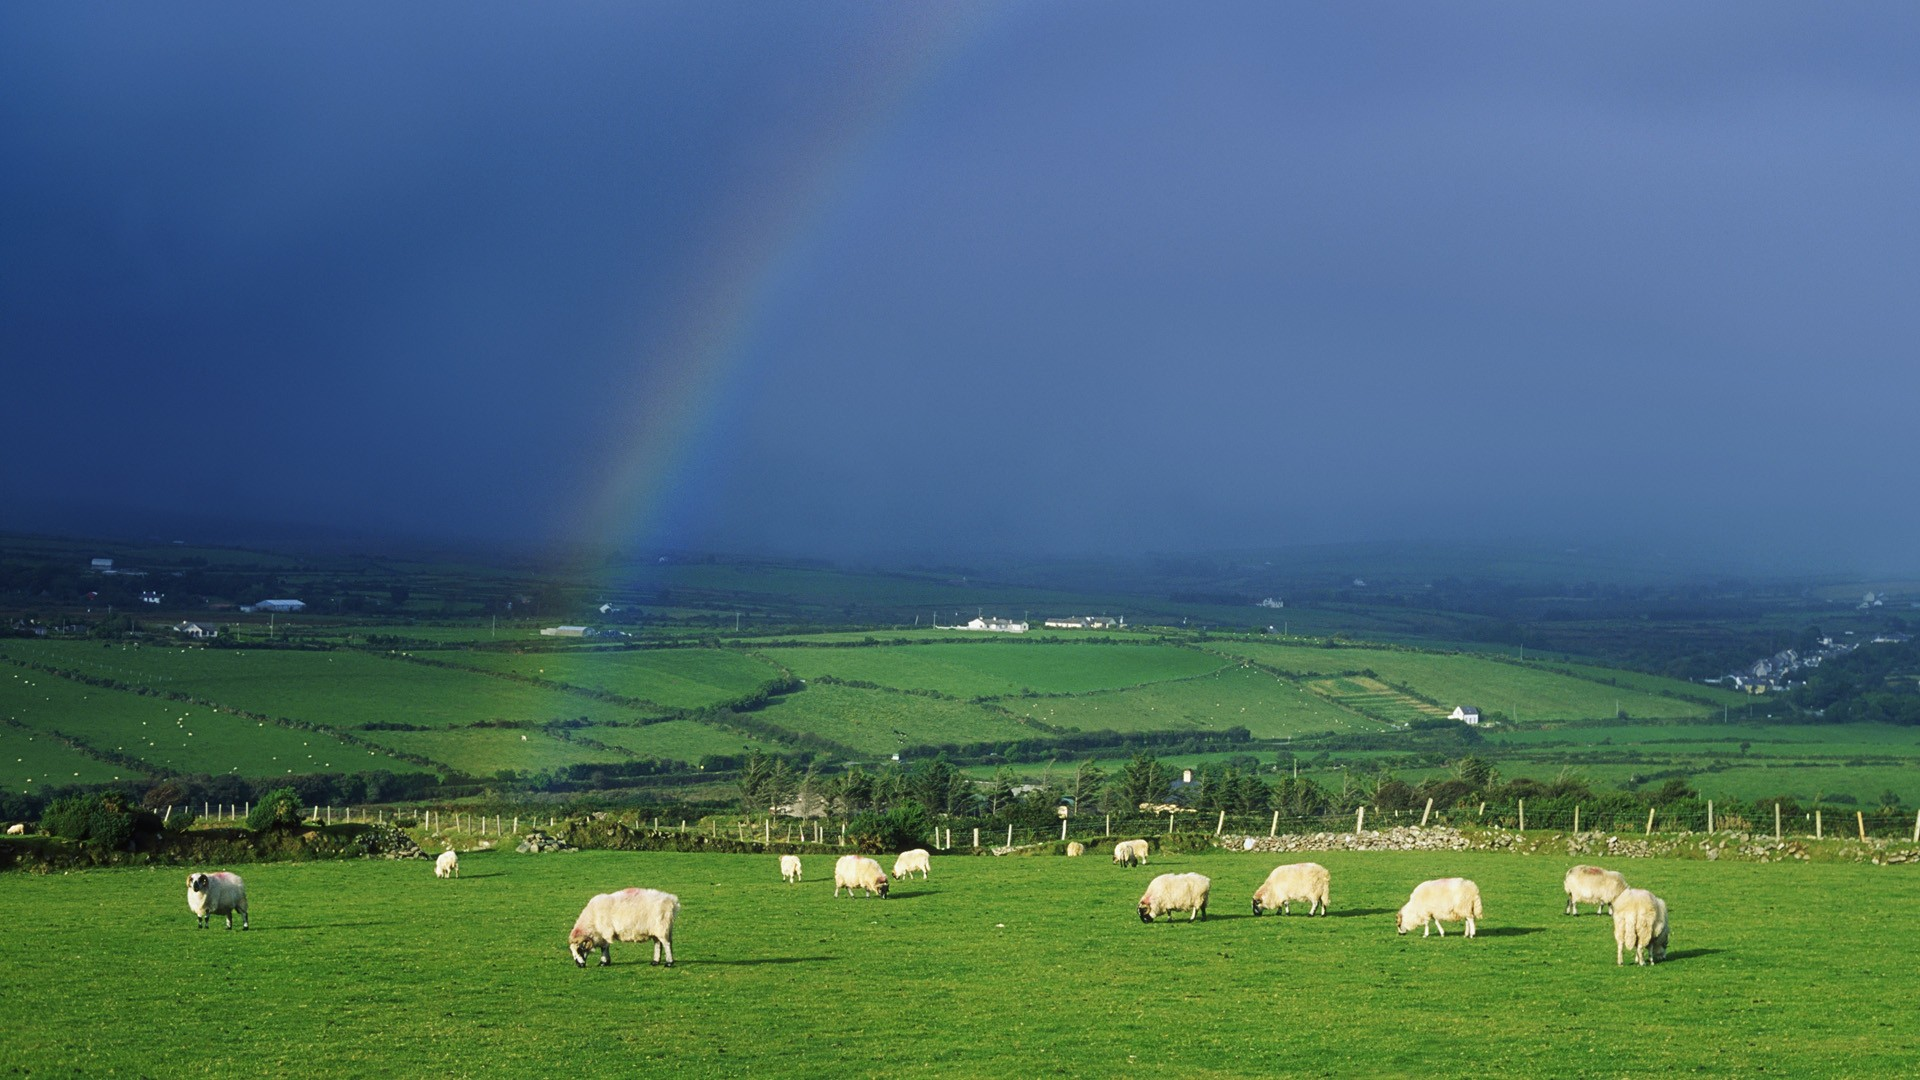 Sheep Ireland Wallpaper 1920x1080 Sheep Ireland Rainbows 1920x1080